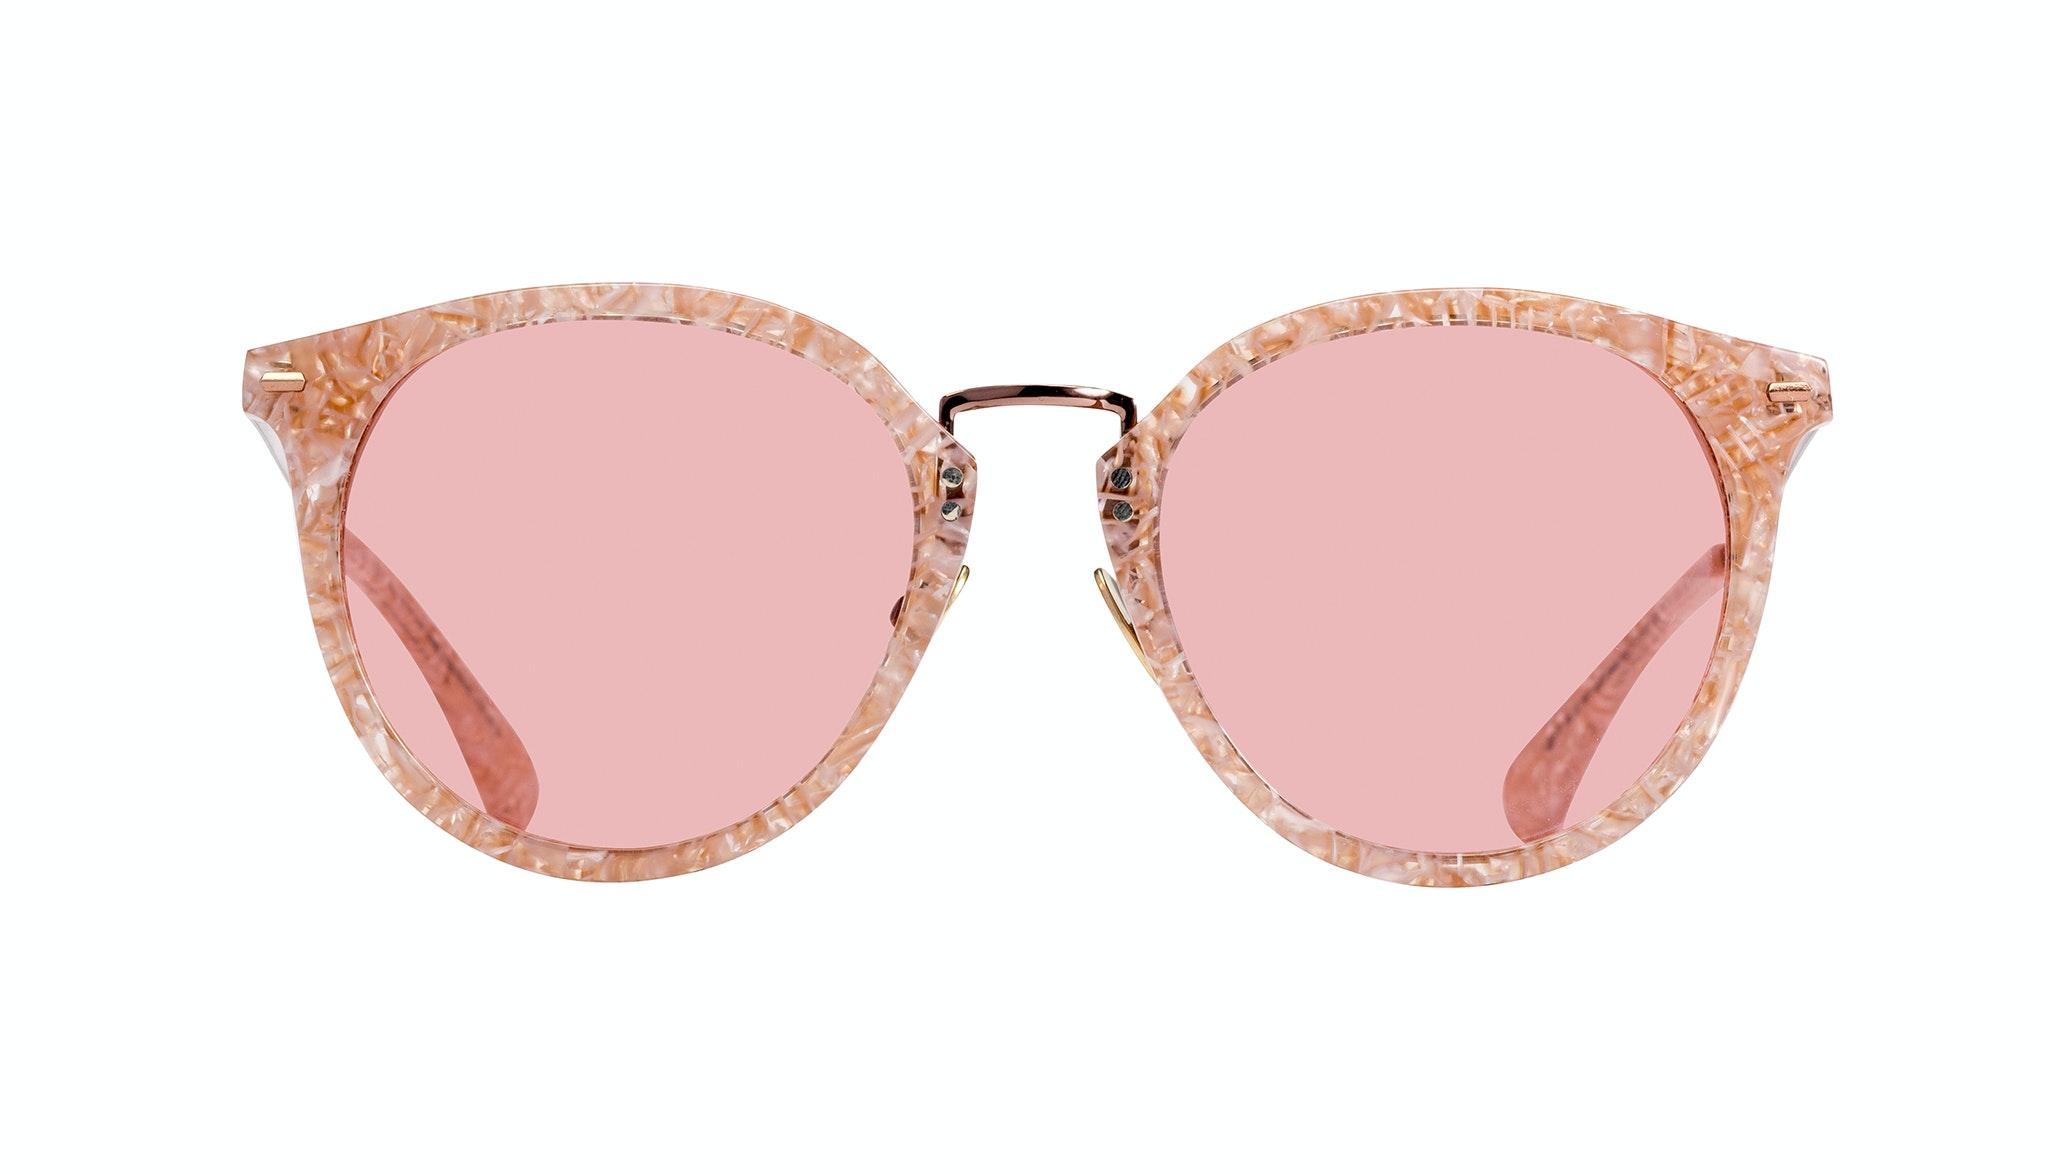 Affordable Fashion Glasses Cat Eye Sunglasses Women Poppy Provence Front